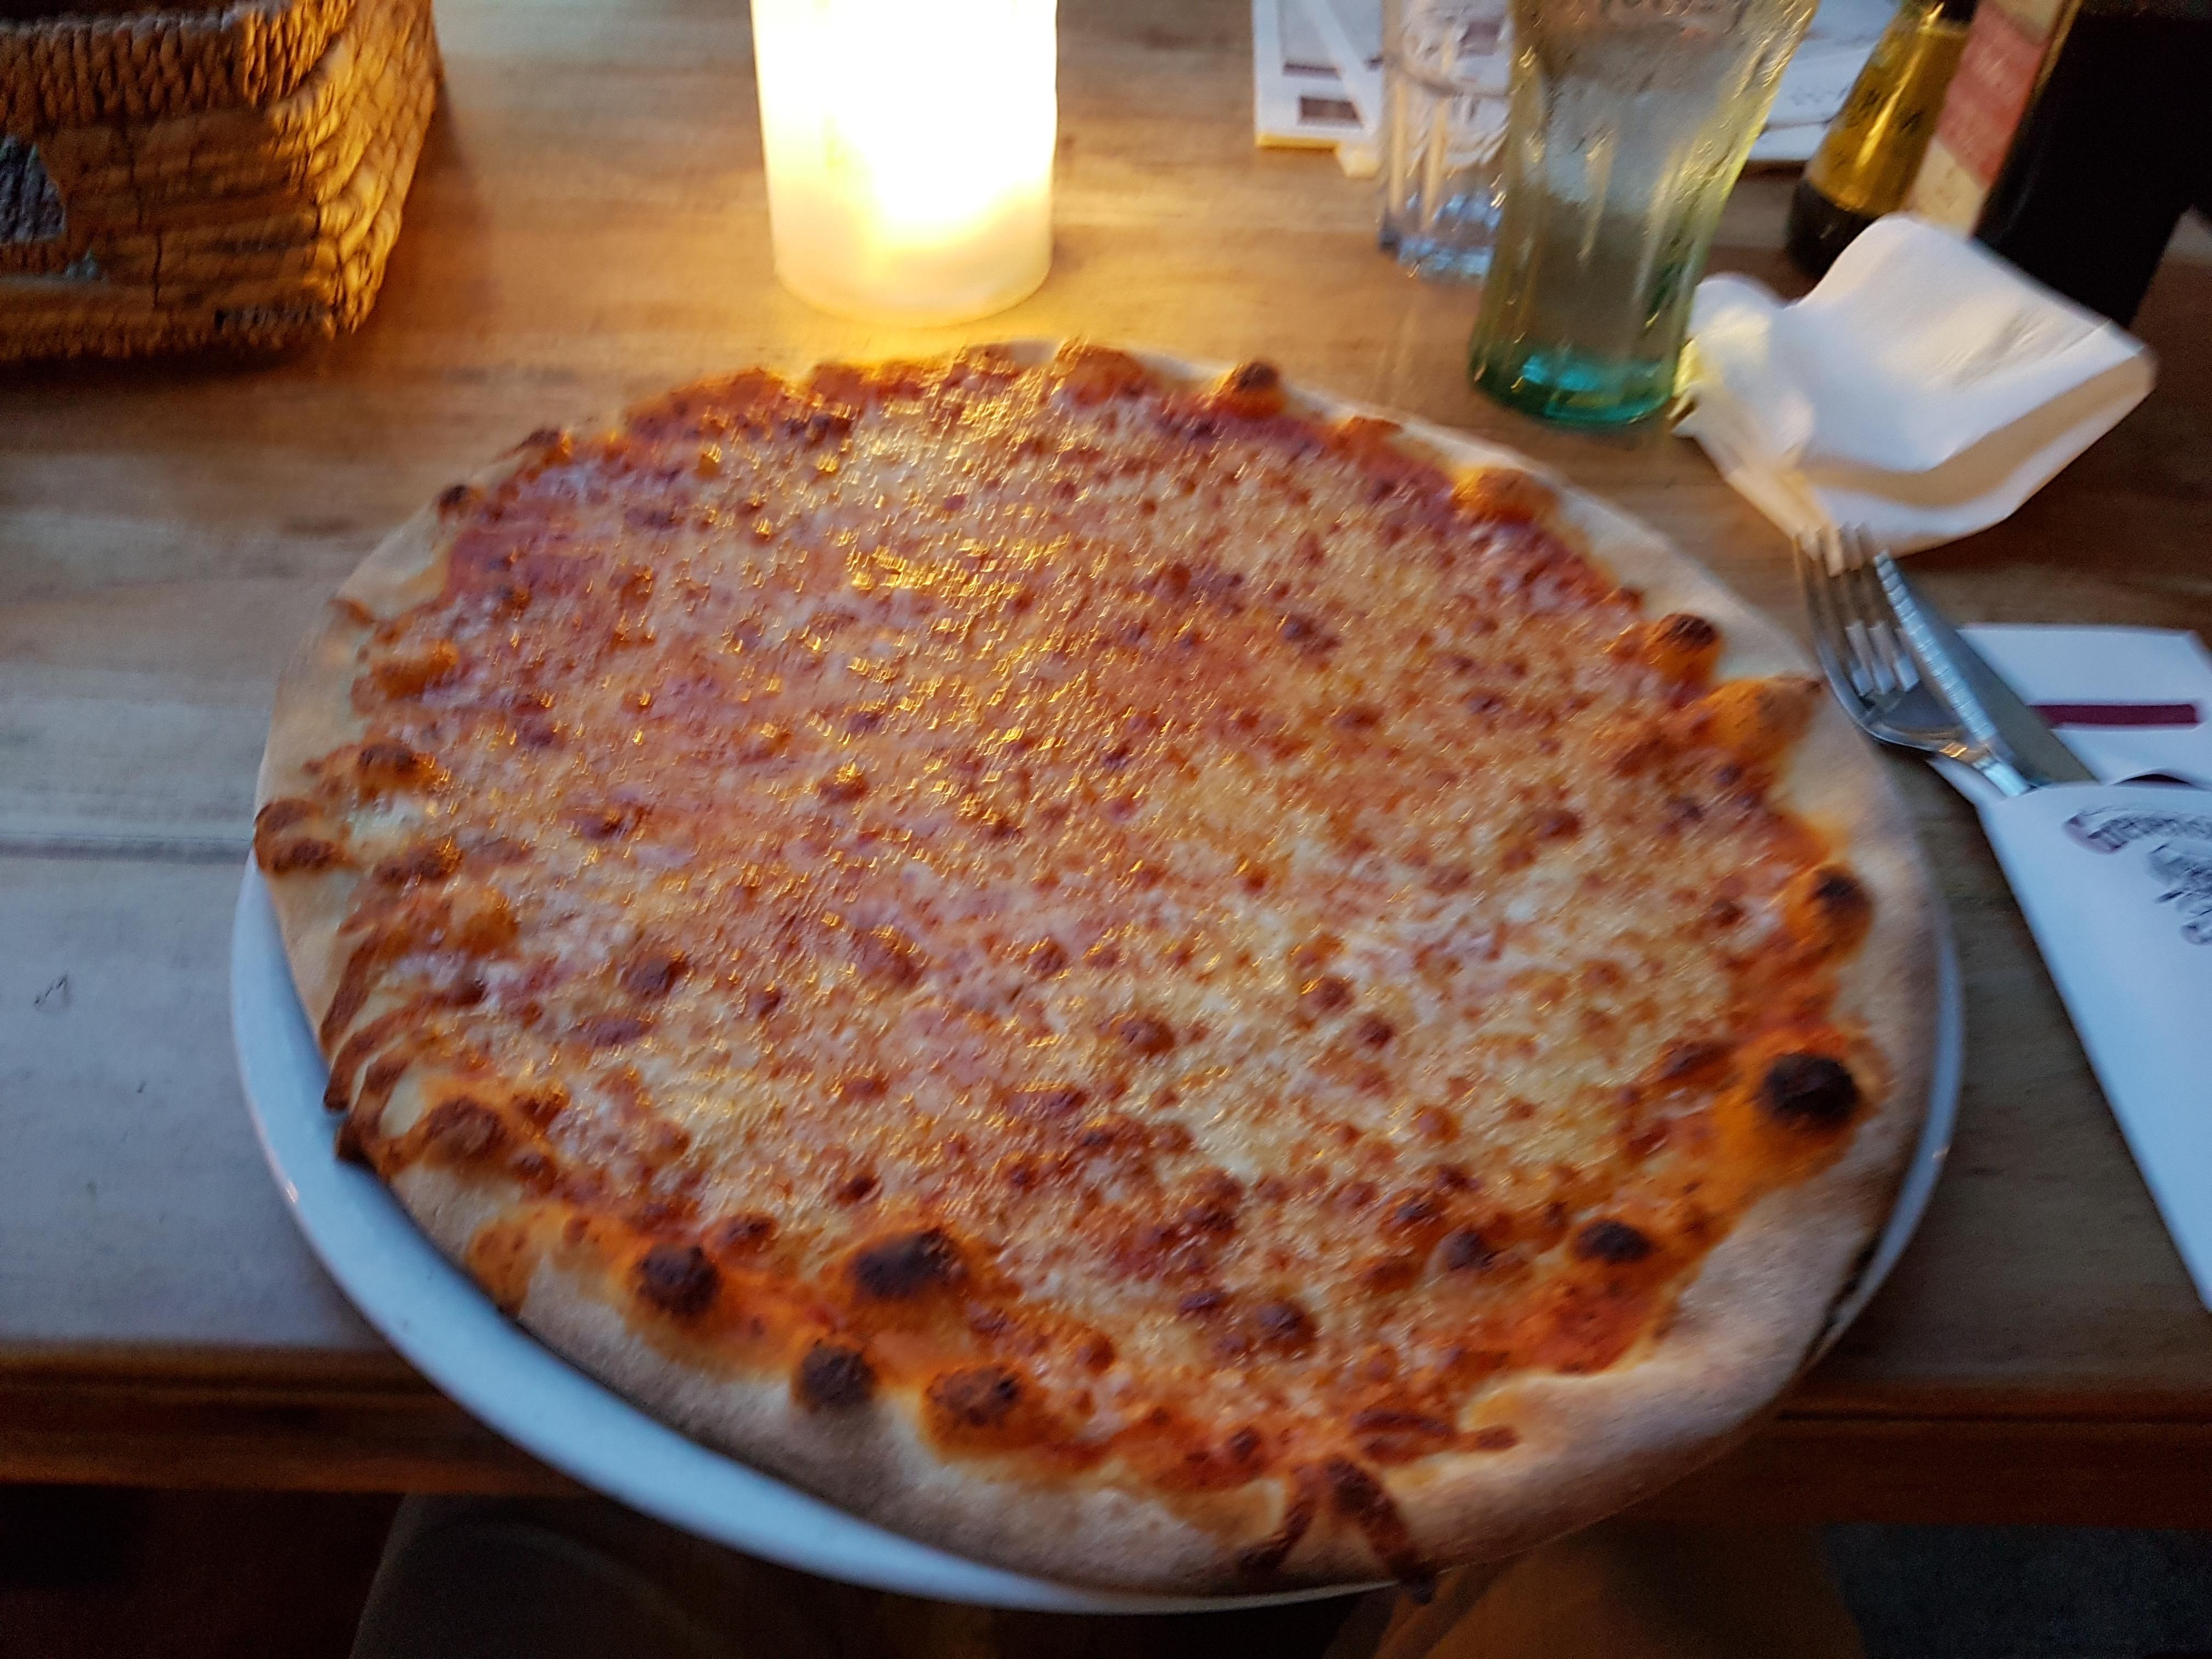 http://foodloader.net/Holz_2017-05-12_Pizza.jpg